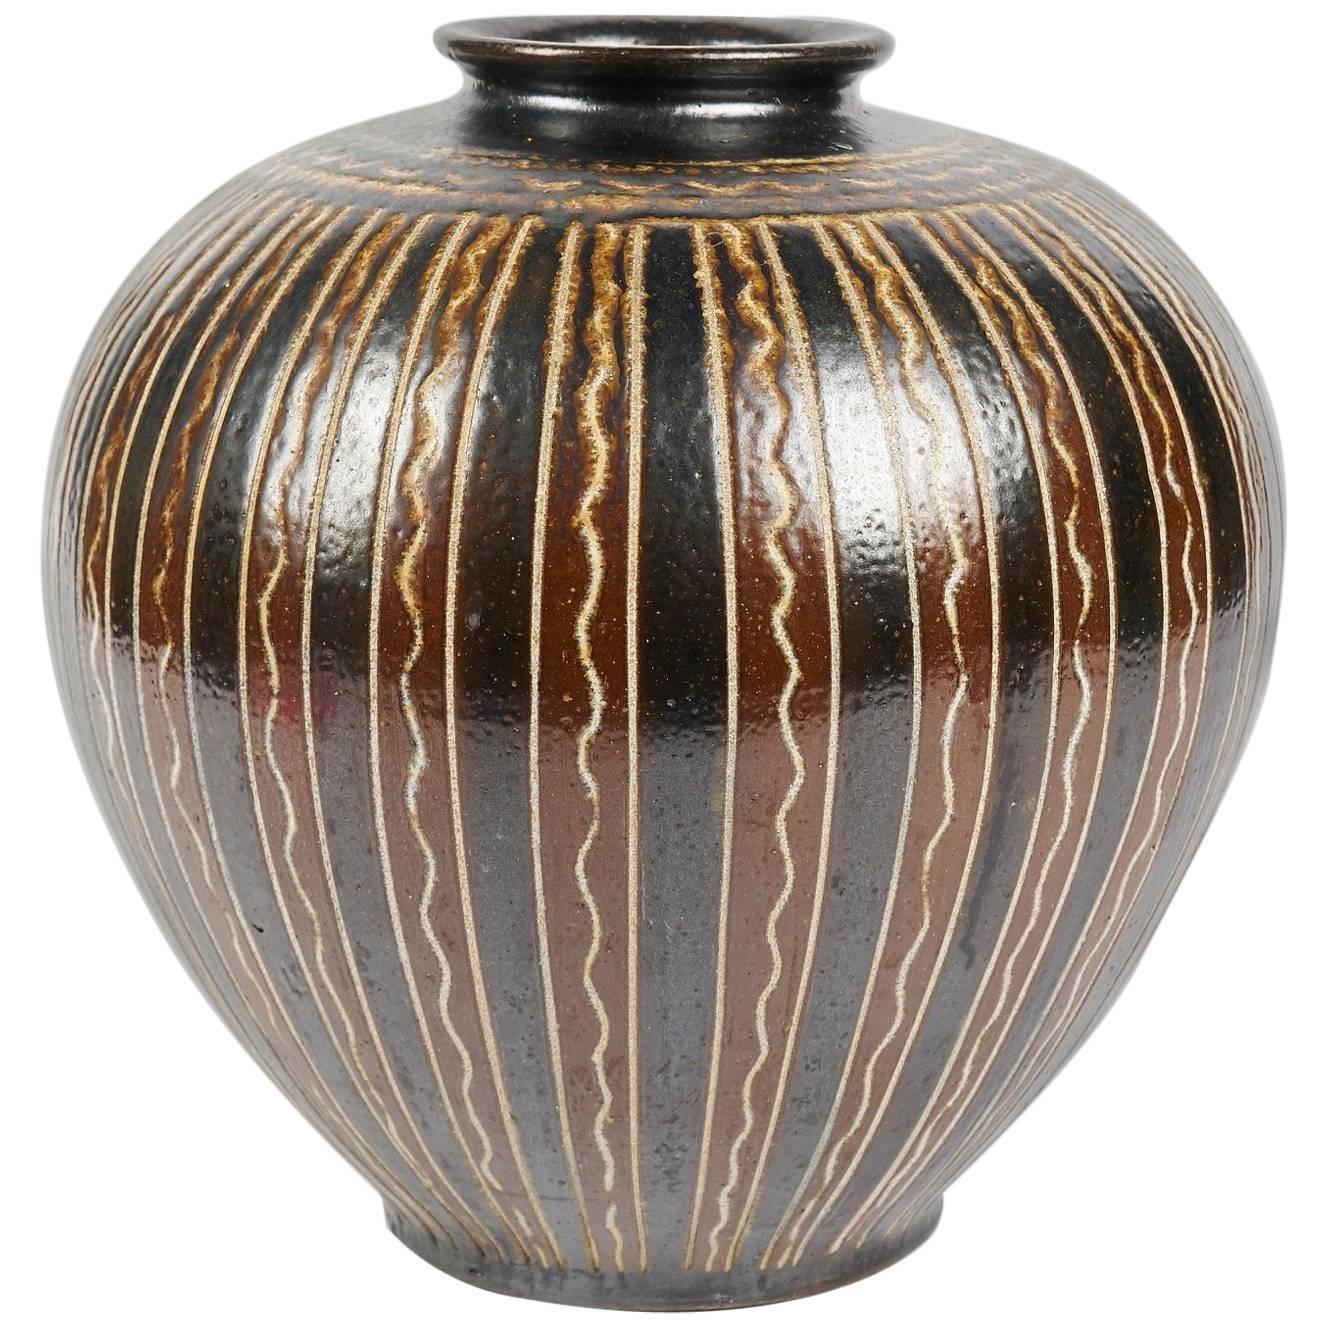 Arthur Andersson, Large Ceramic Vase, Sweden, circa 1950s